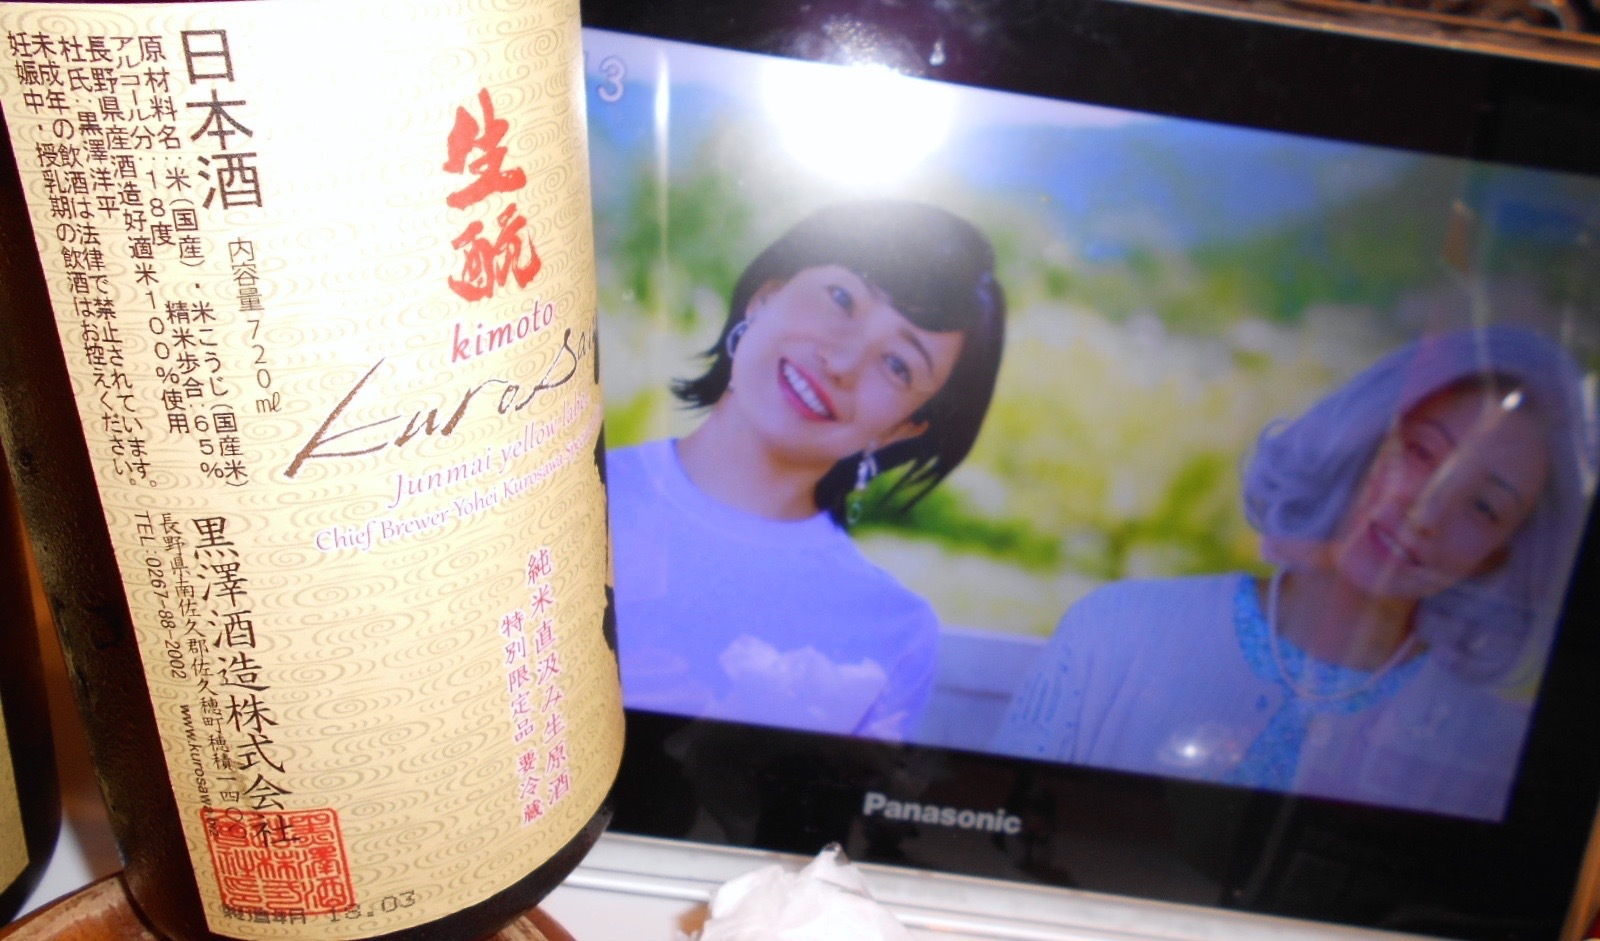 kurosawa_yellow29by6_2.jpg